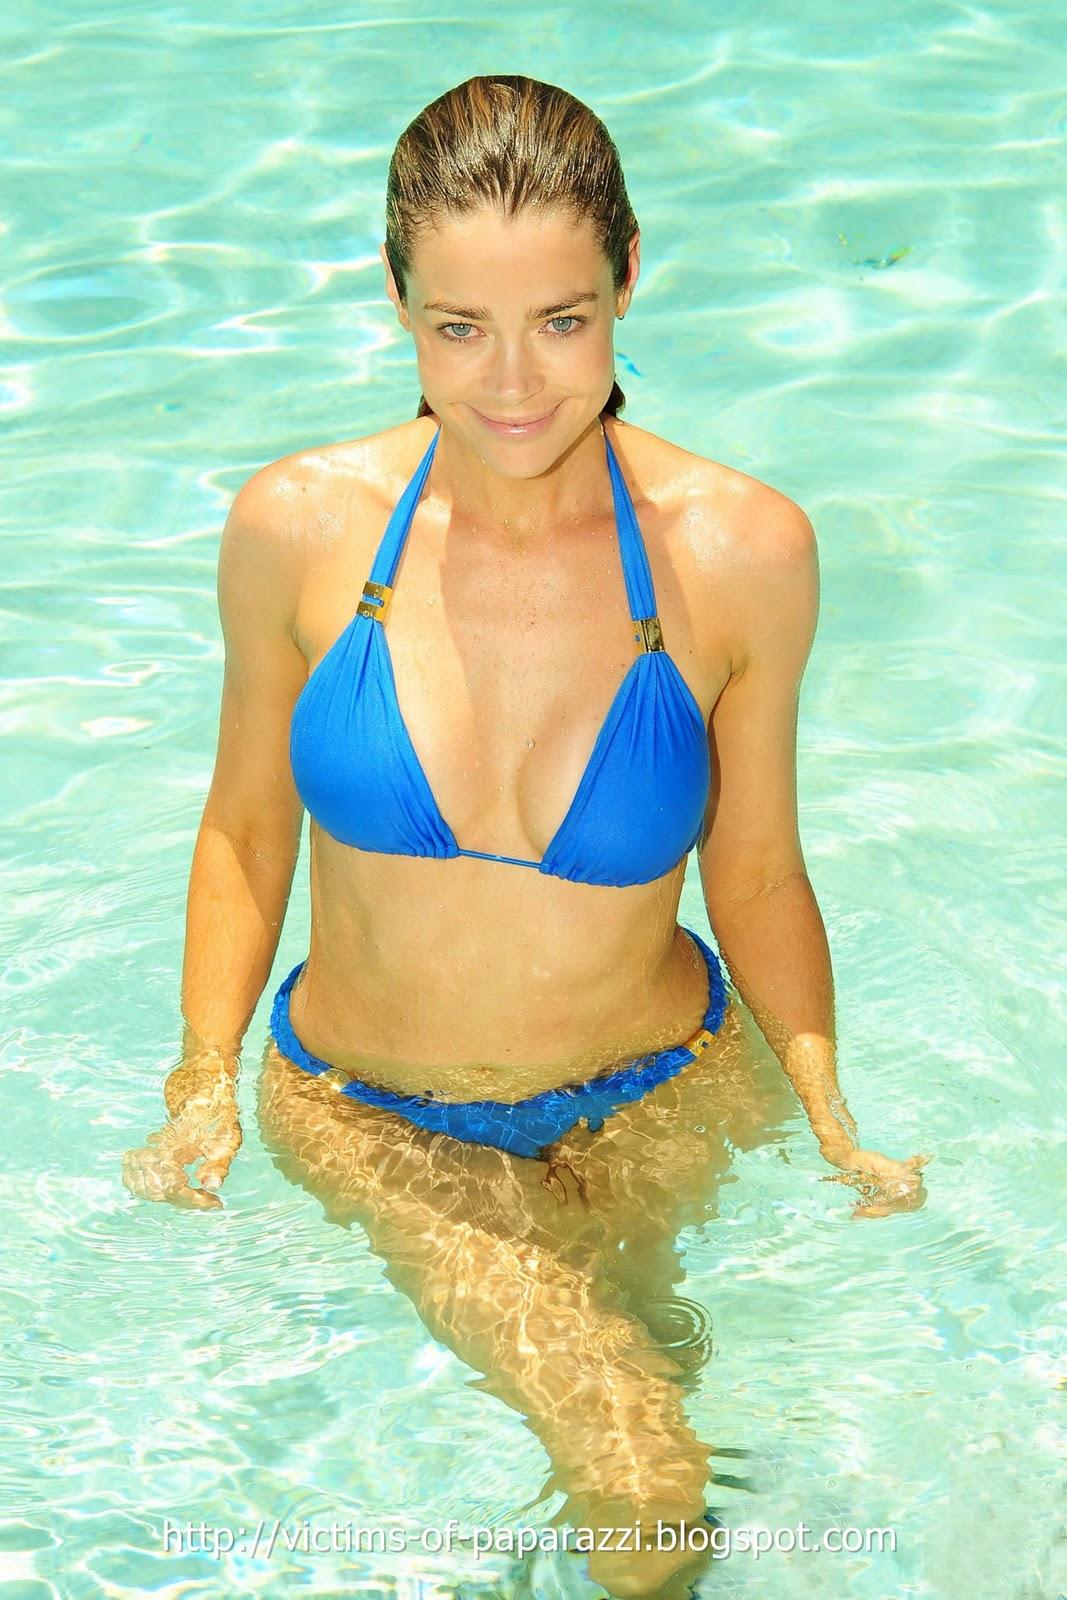 http://1.bp.blogspot.com/_NFcDSk31Yq8/TM_c34aU9kI/AAAAAAAAAV8/JZSYqzBxWkg/s1600/Denise+Richards+blue+bikini+3.jpg